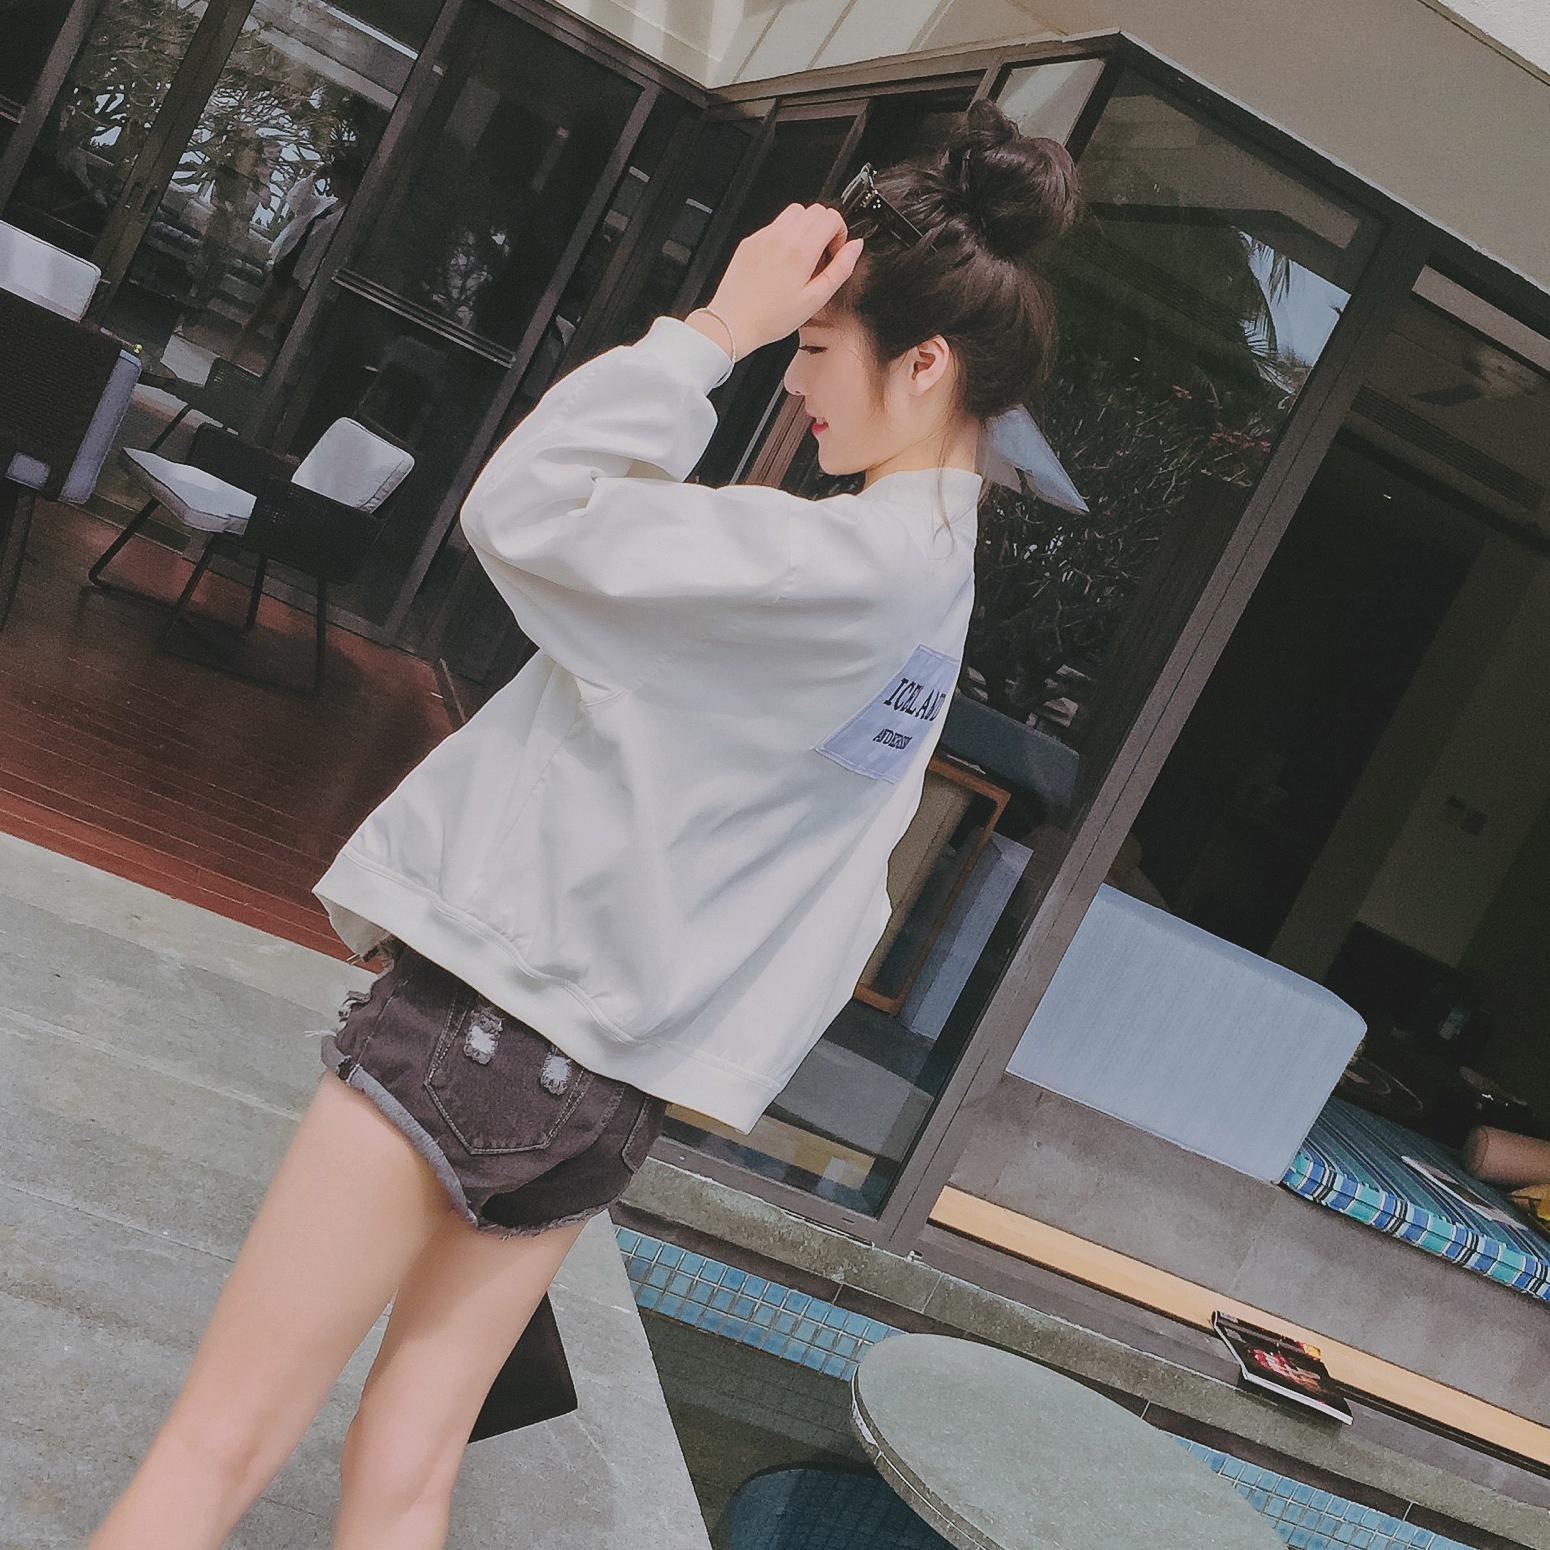 2017 musim semi model baru pakaian wanita Gaya Korea model pendek Jaket  bisbol huruf casual longgar 5faf21b4fd